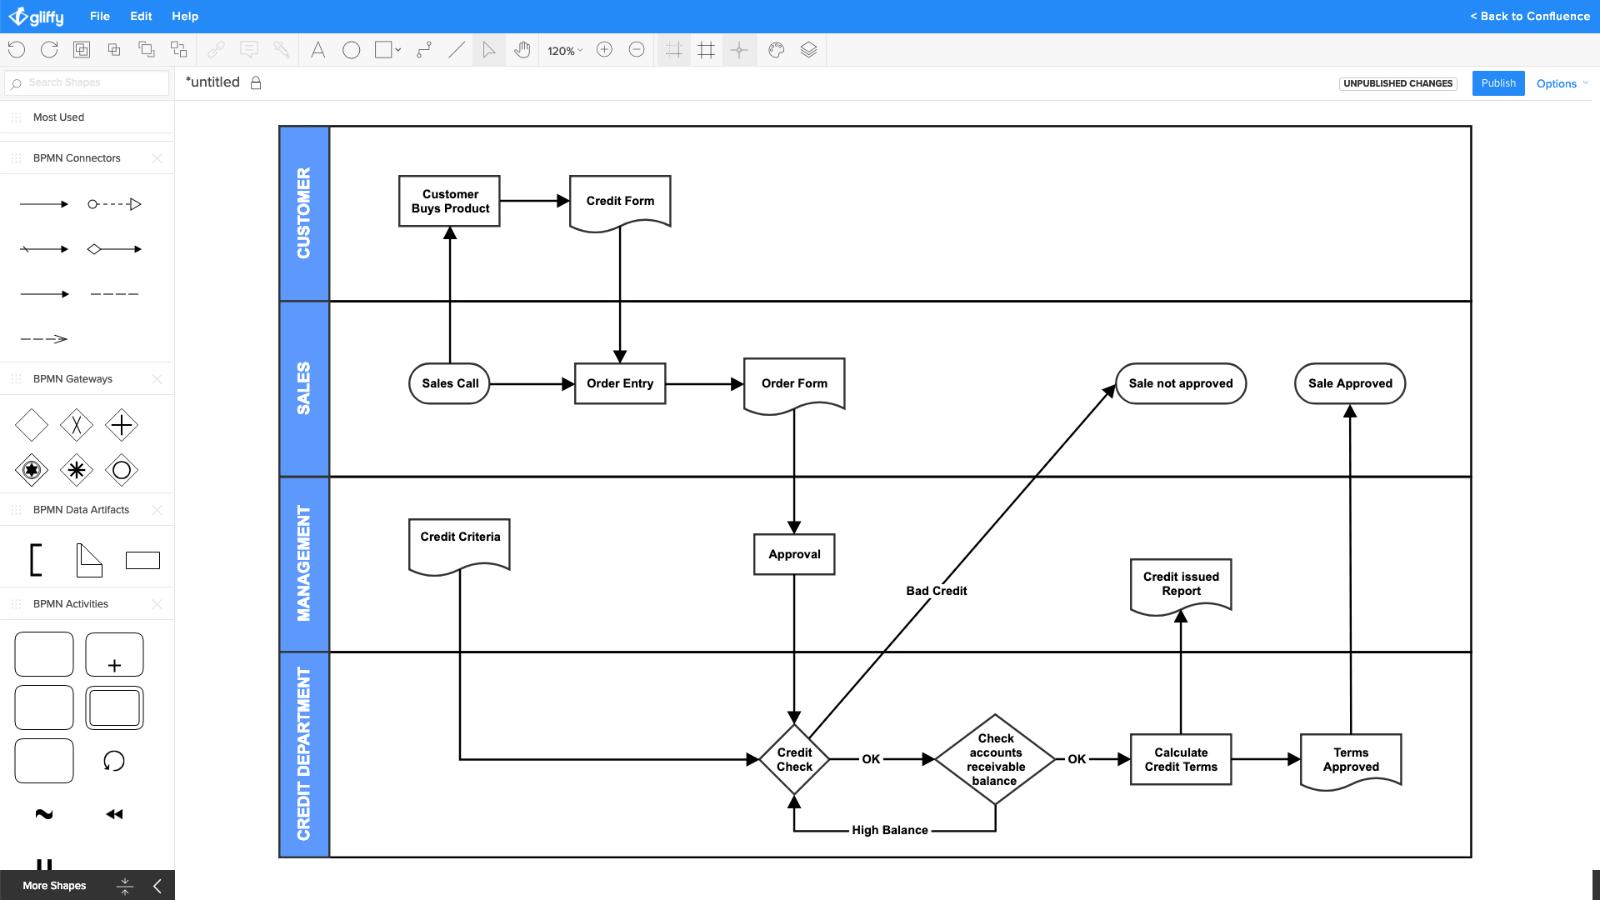 Sample eCommerce transaction process diagram courtesy of gliffy